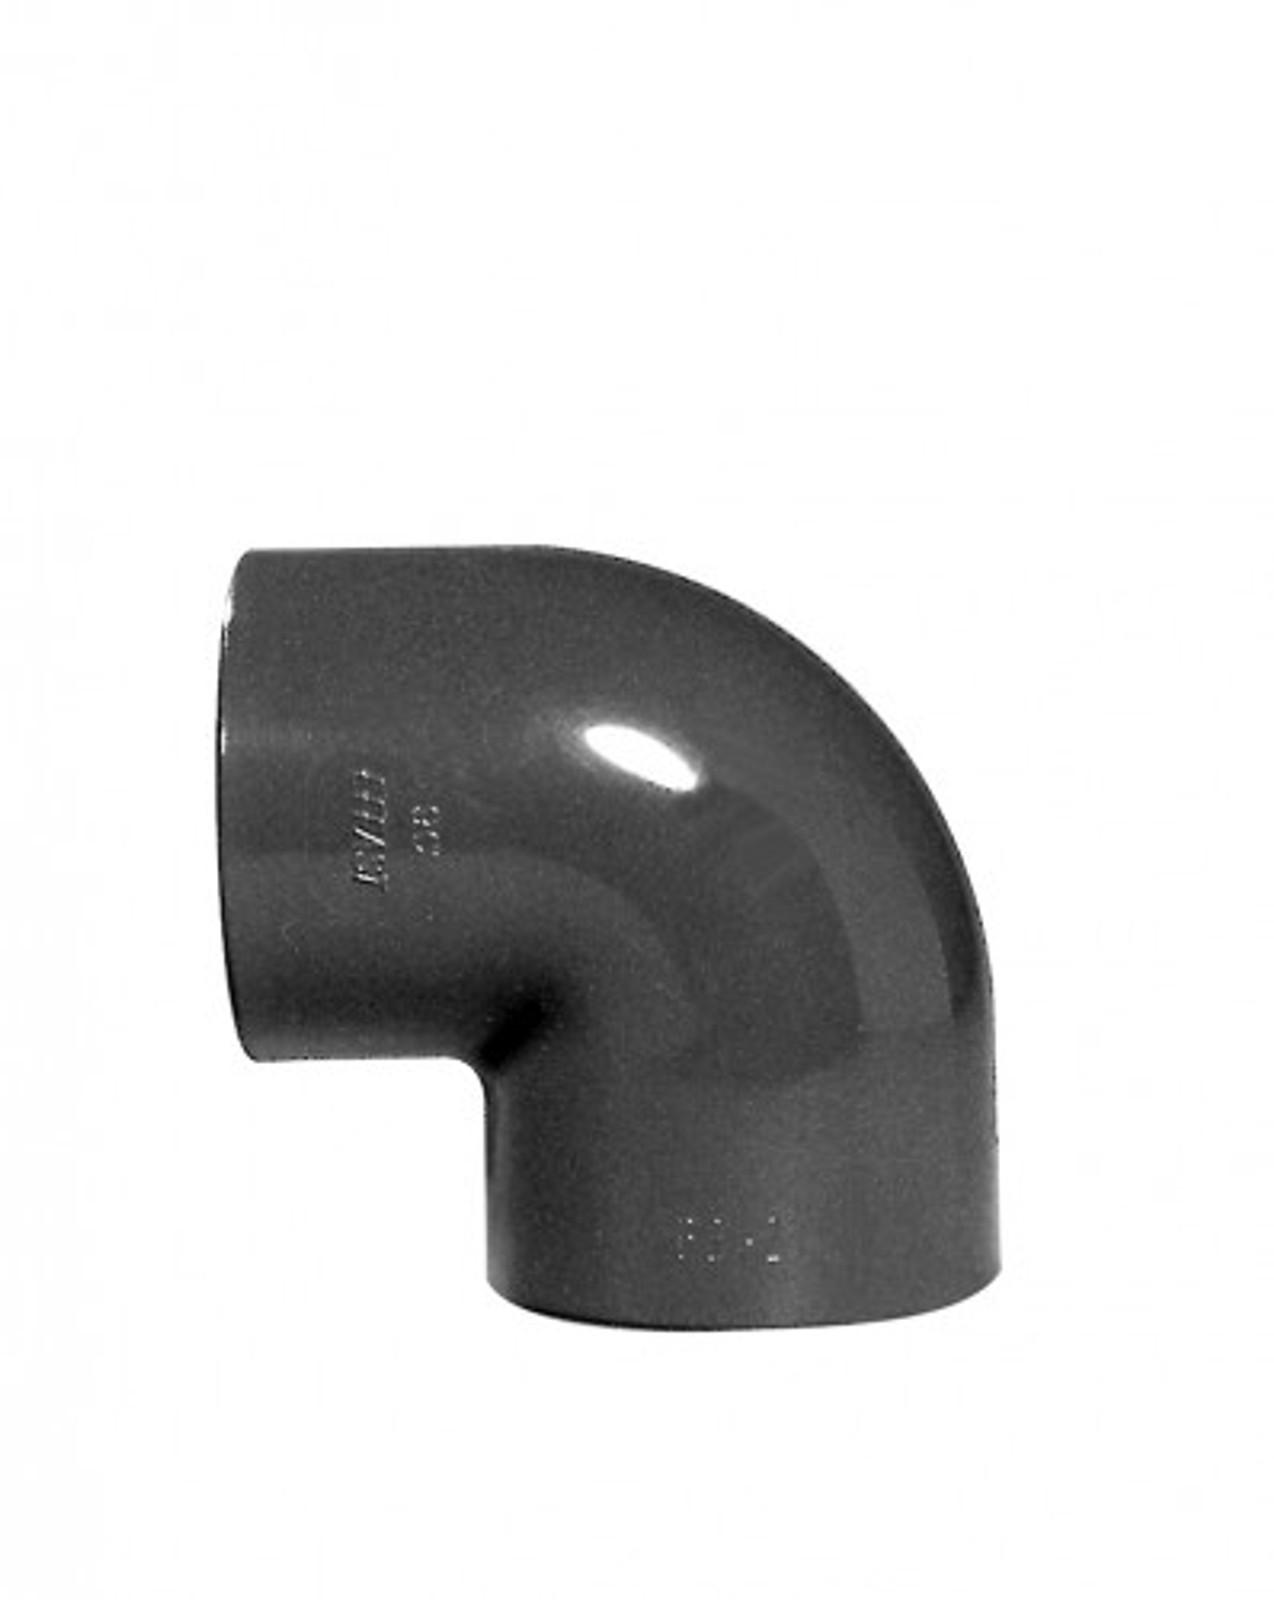 Winkel 90°, 110 mm aus PVC